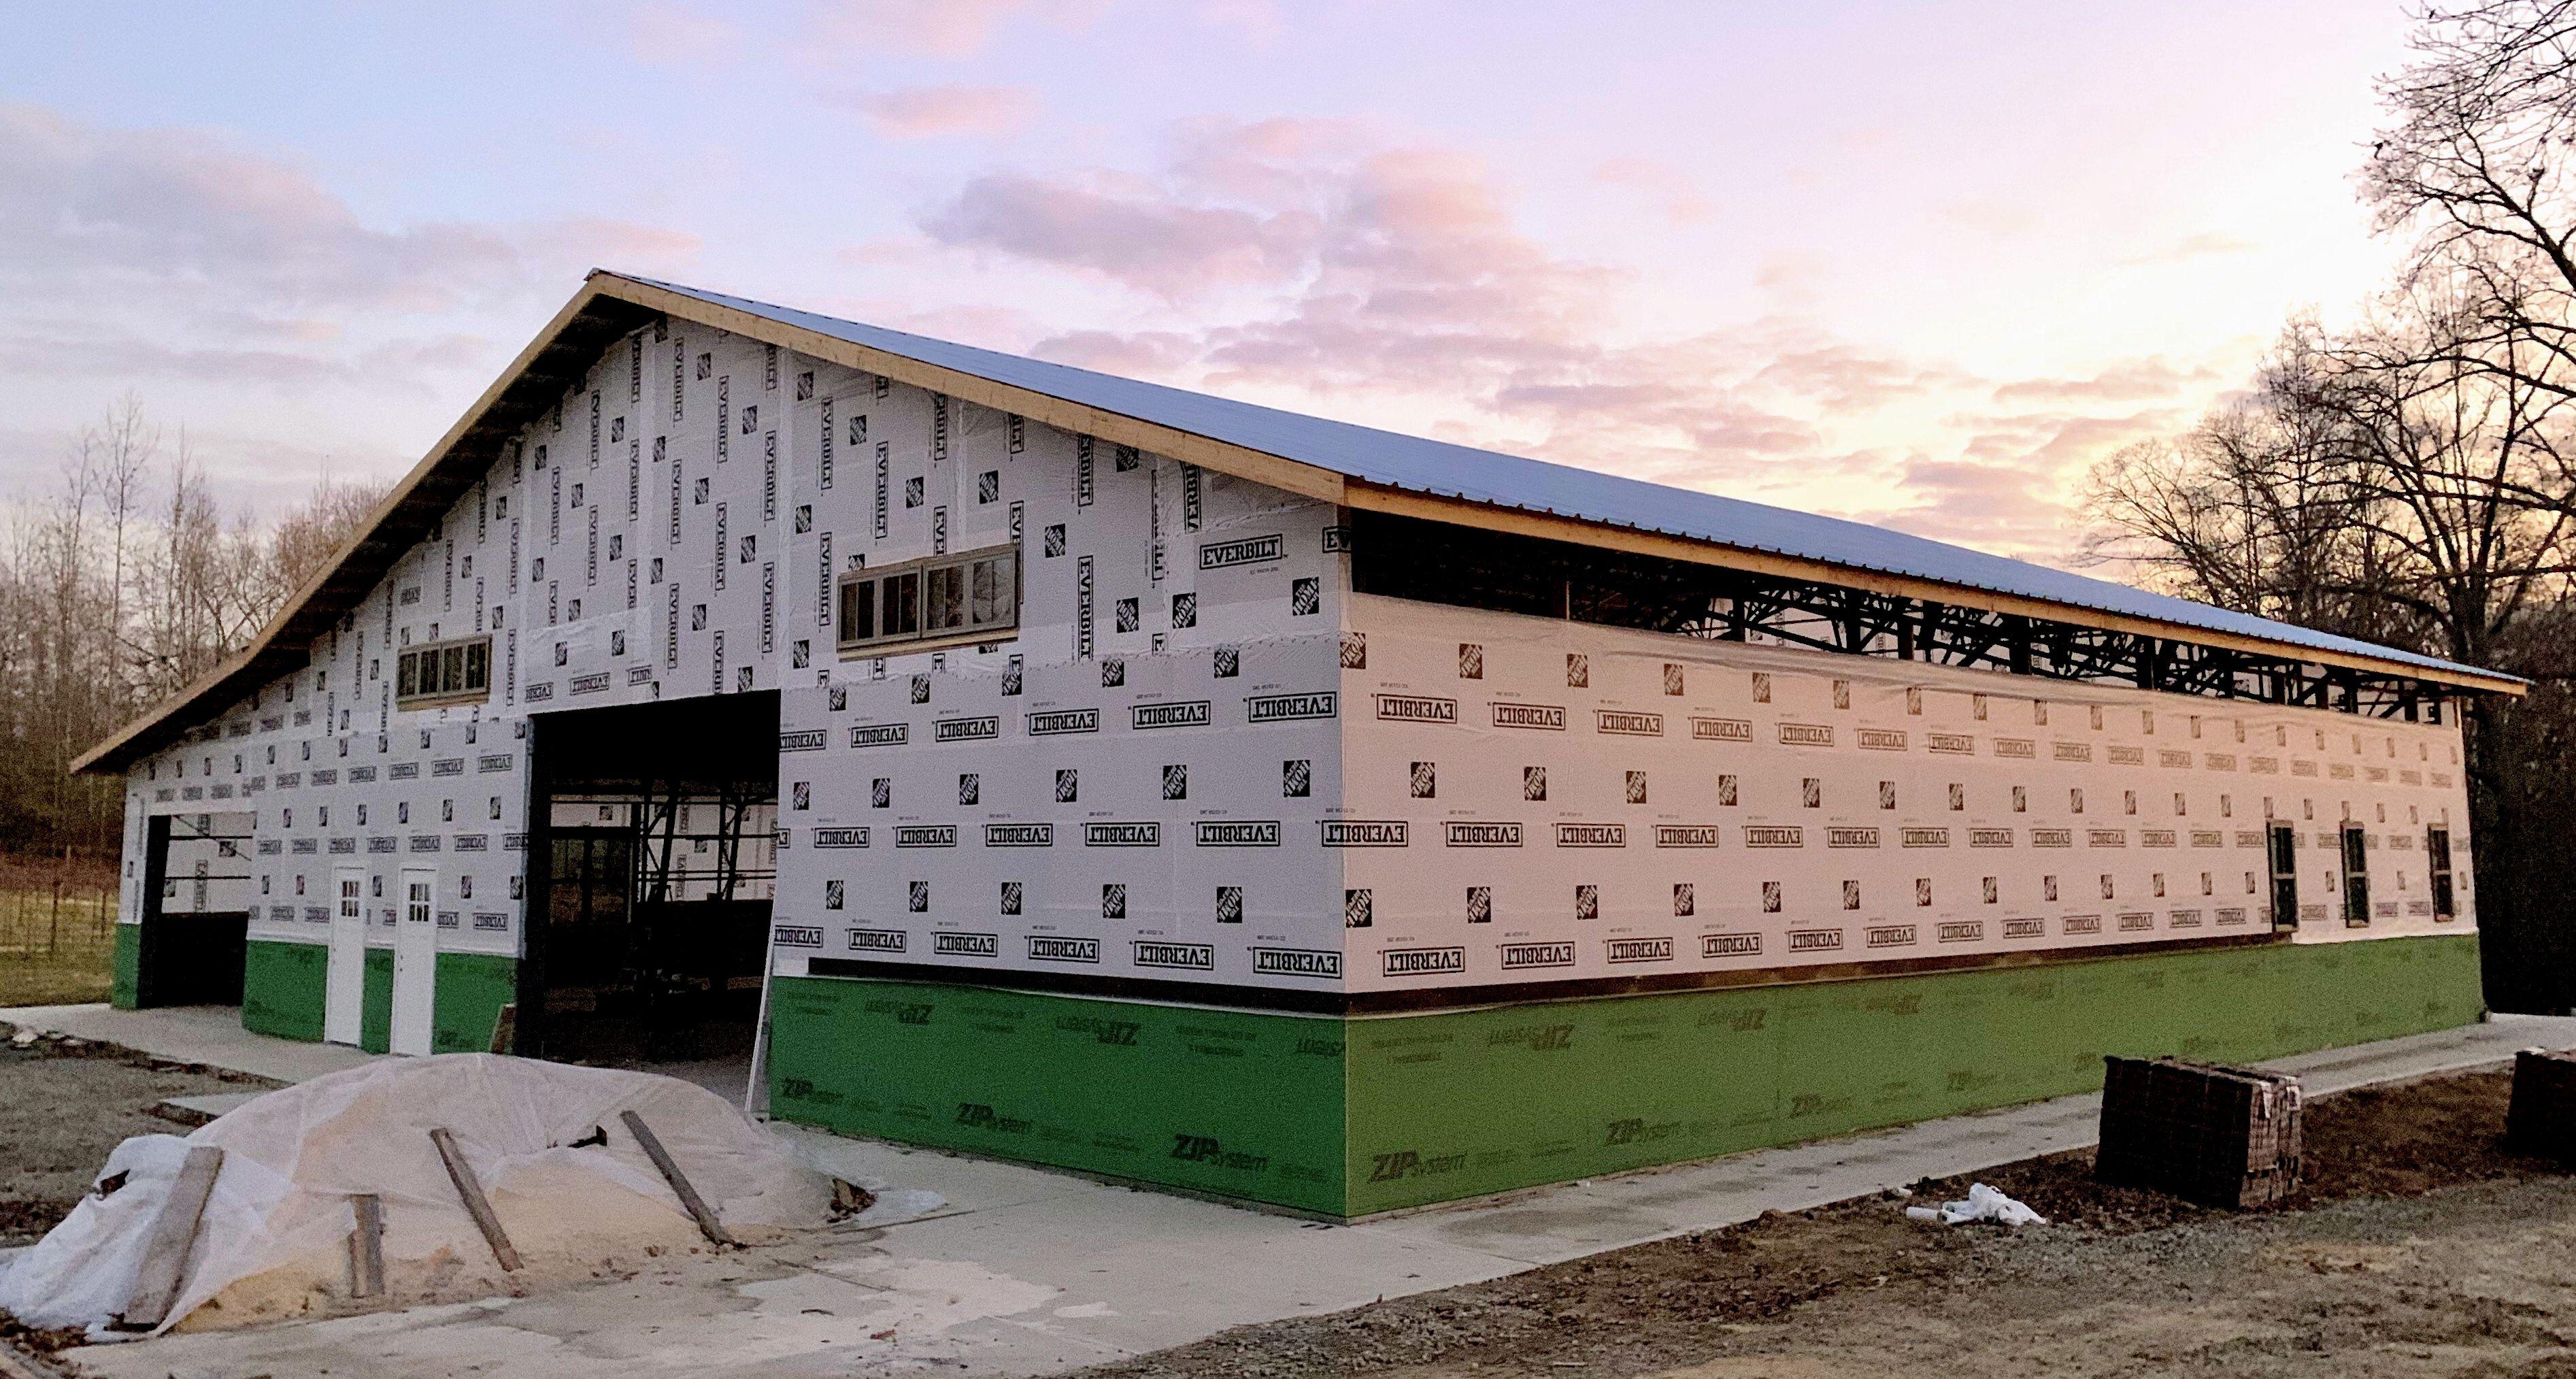 Home Home building kits, Diy building, Metal buildings